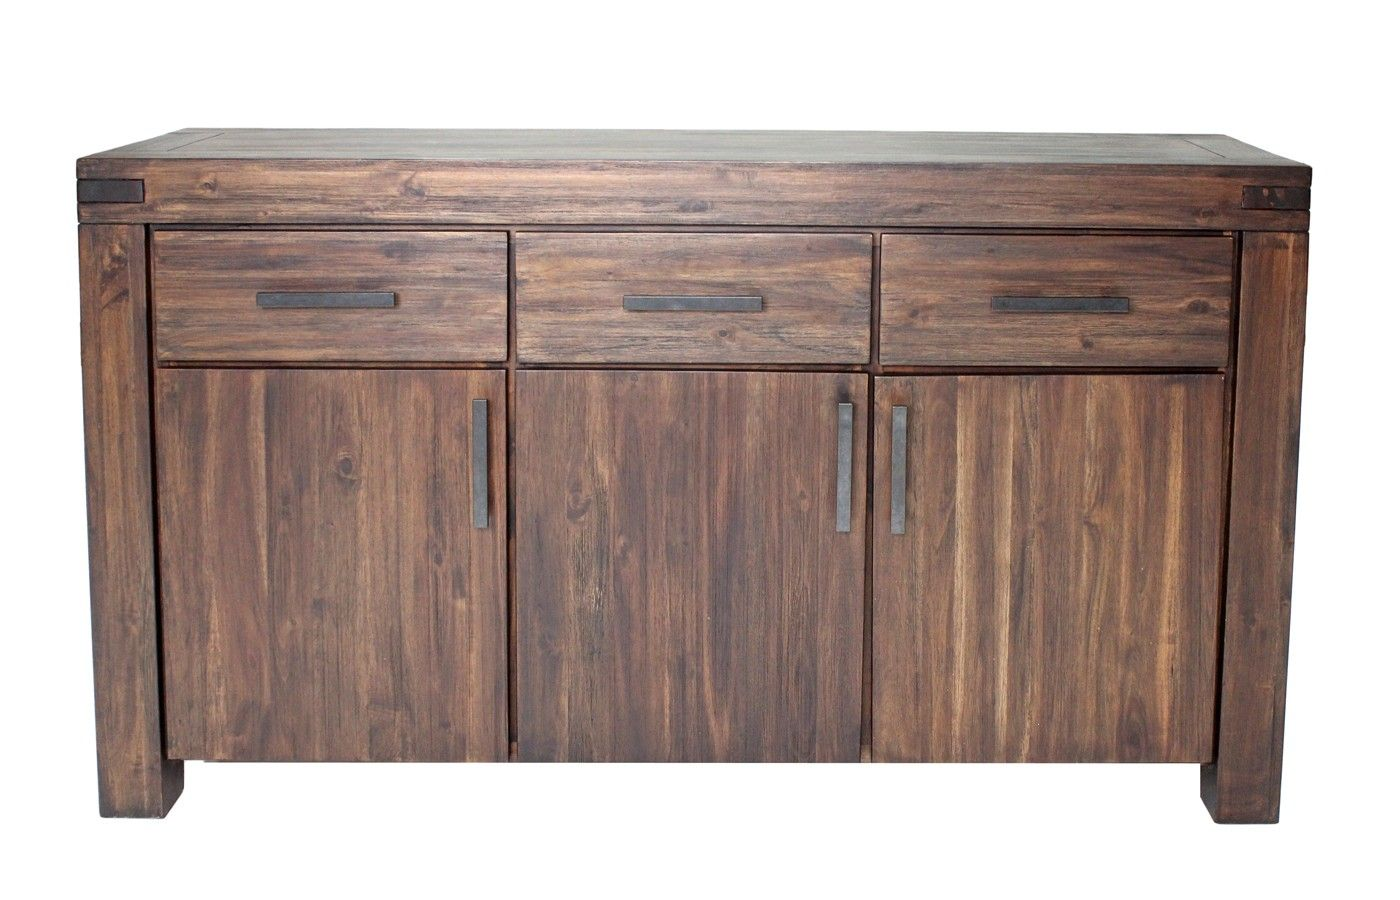 Meadow Server Servers Dining Room Mor Furniture for